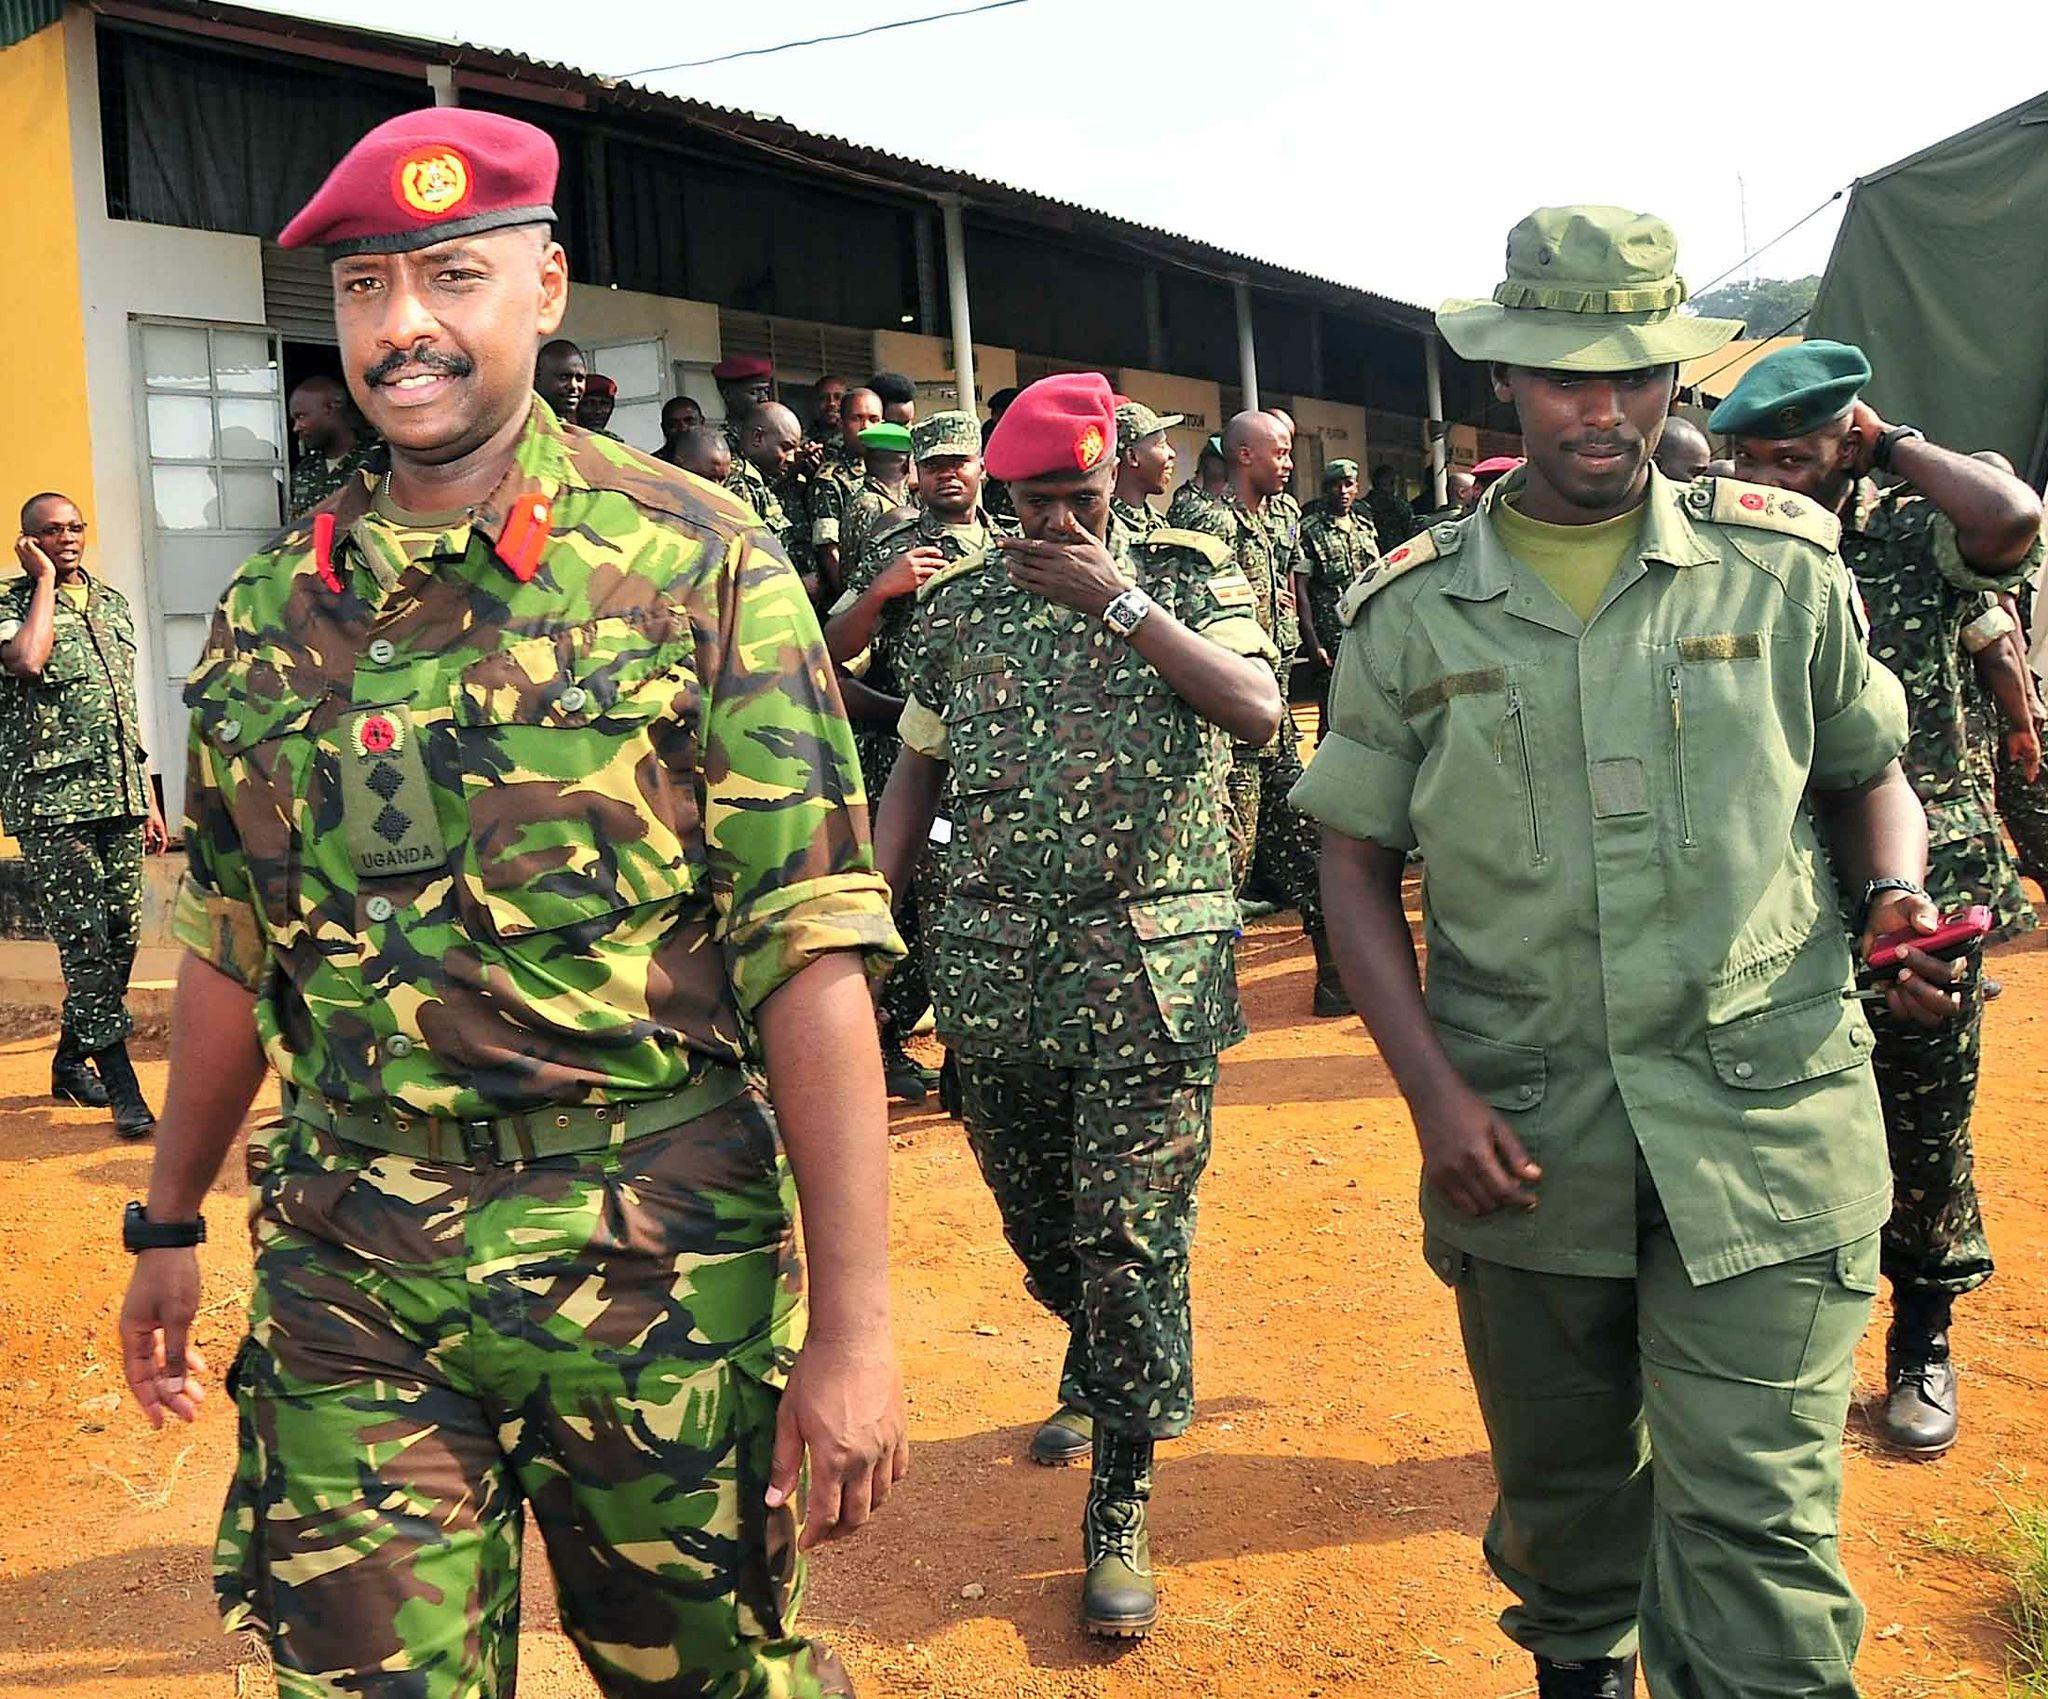 Uganda: Museveni Promotes Son to Major-General in Army